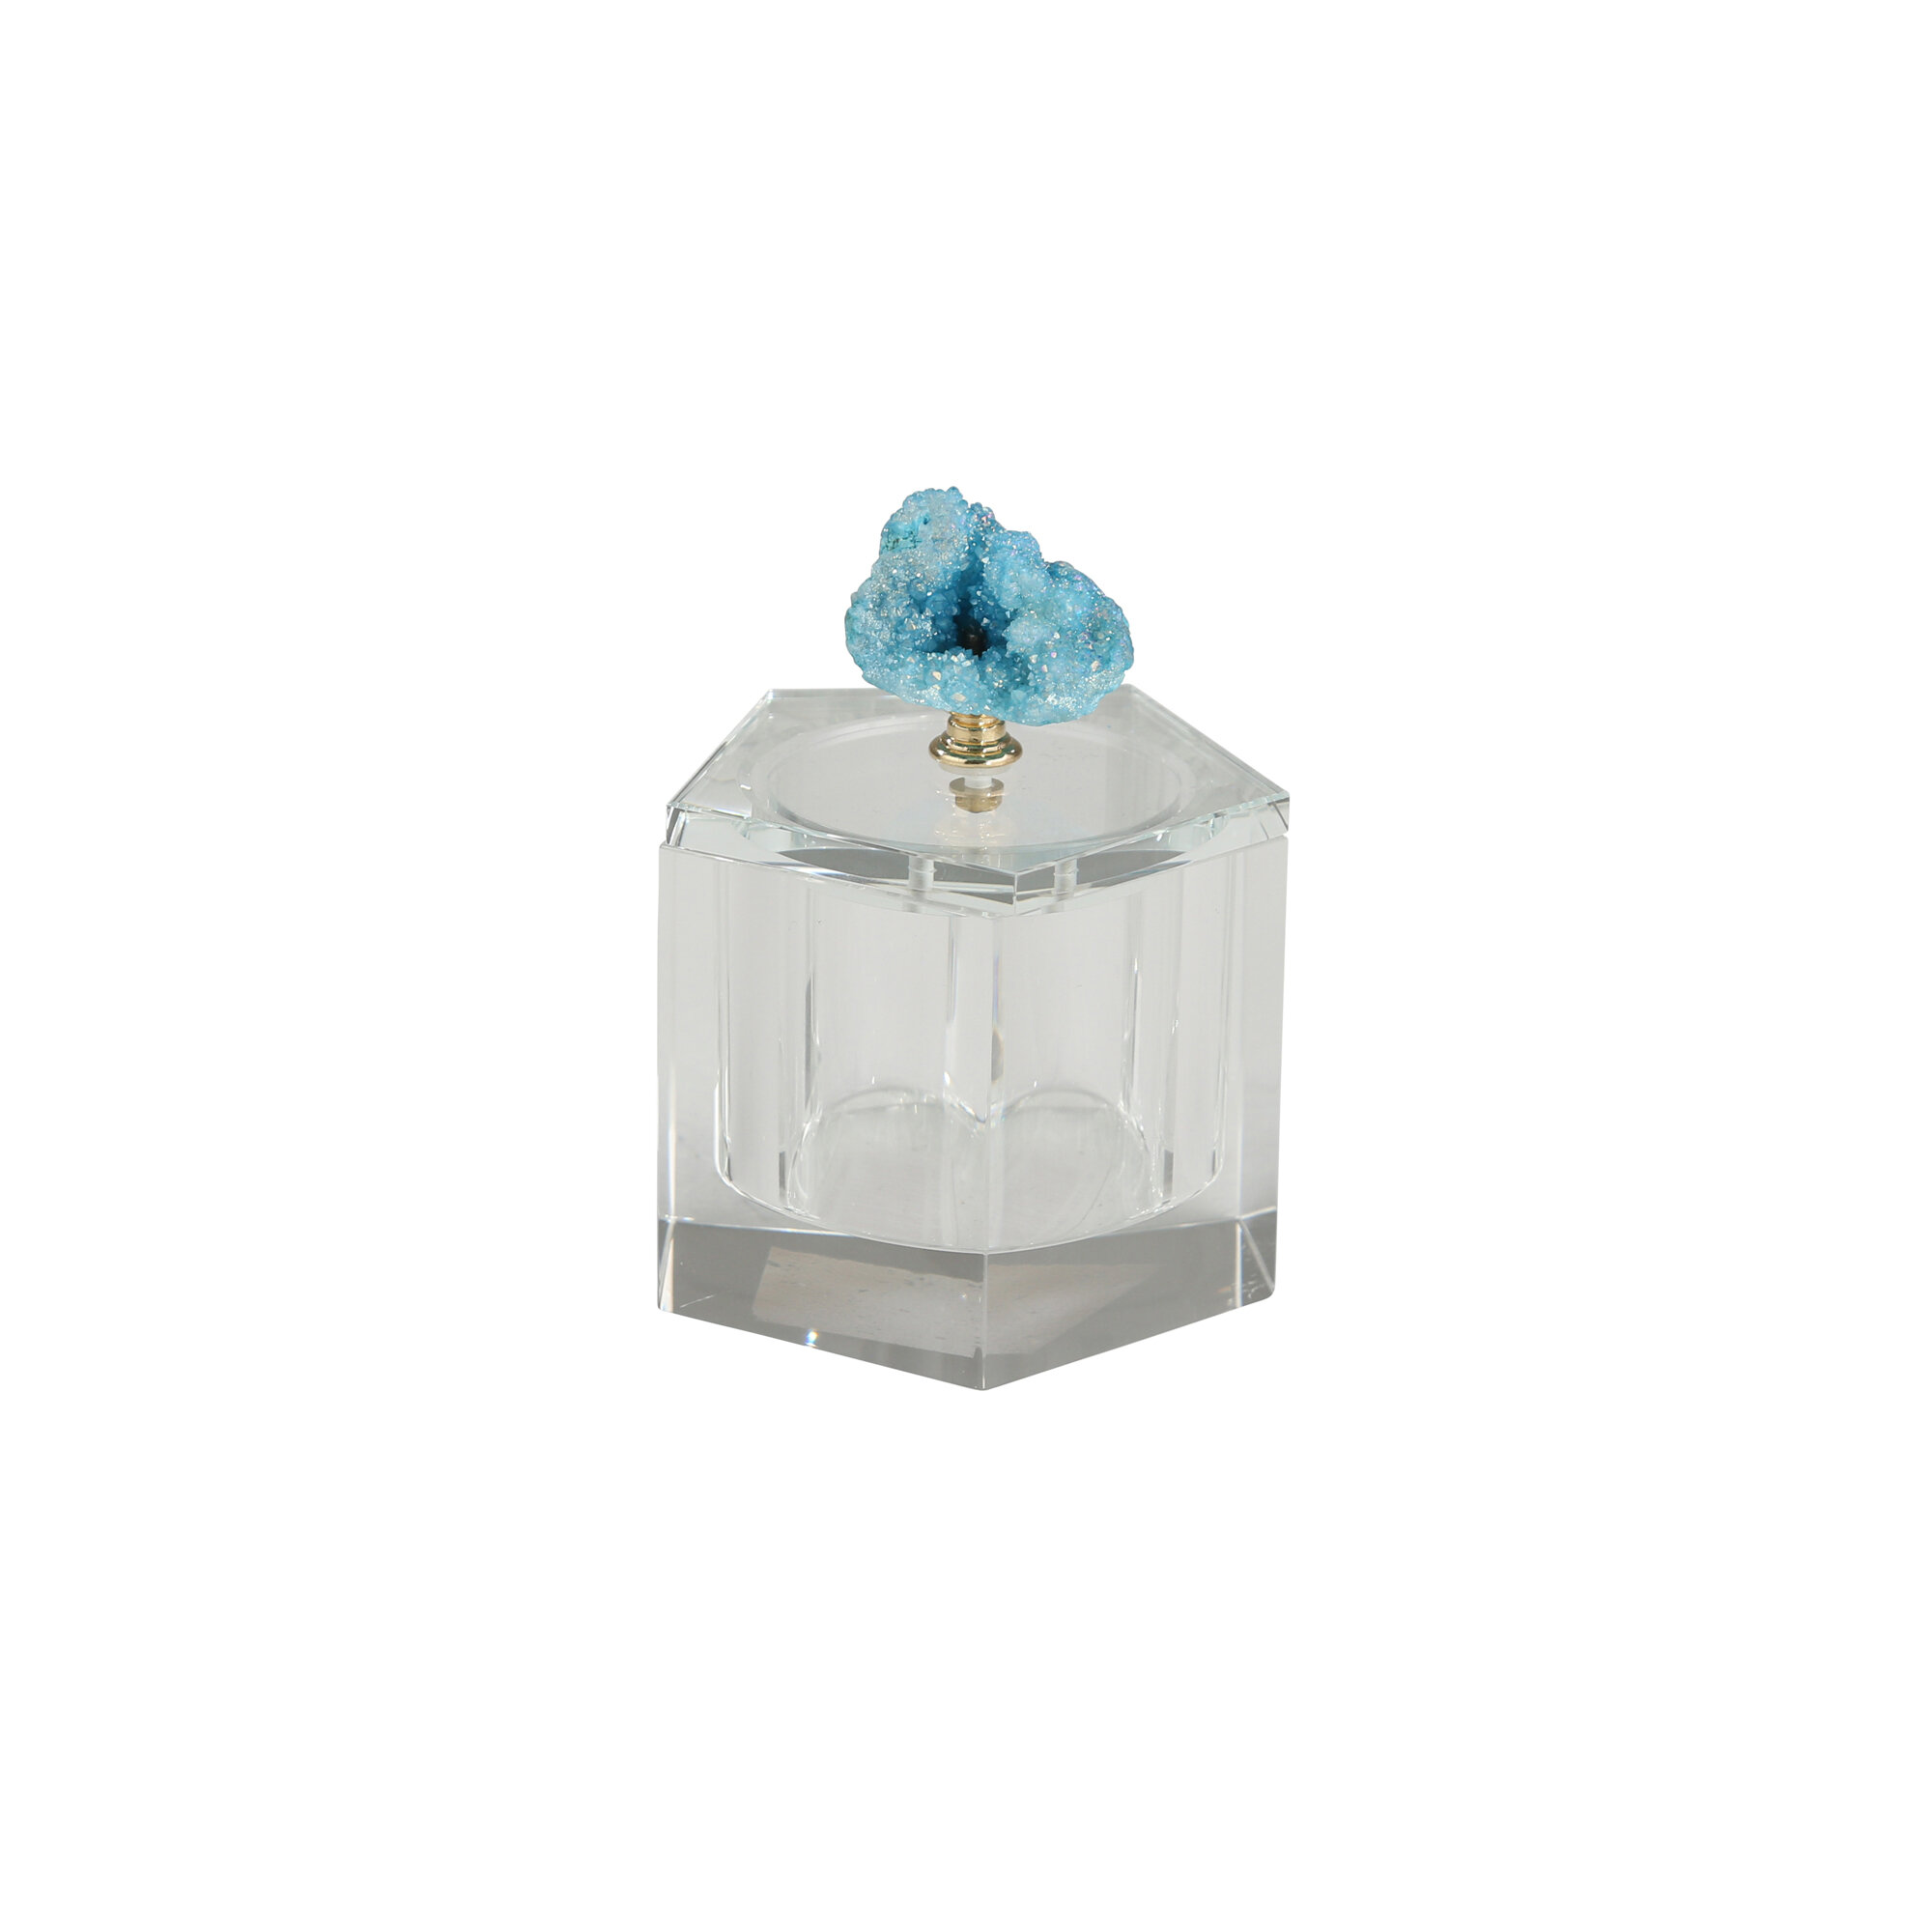 Orren Ellis Neville Crystal Covered Decorative Box Wayfair